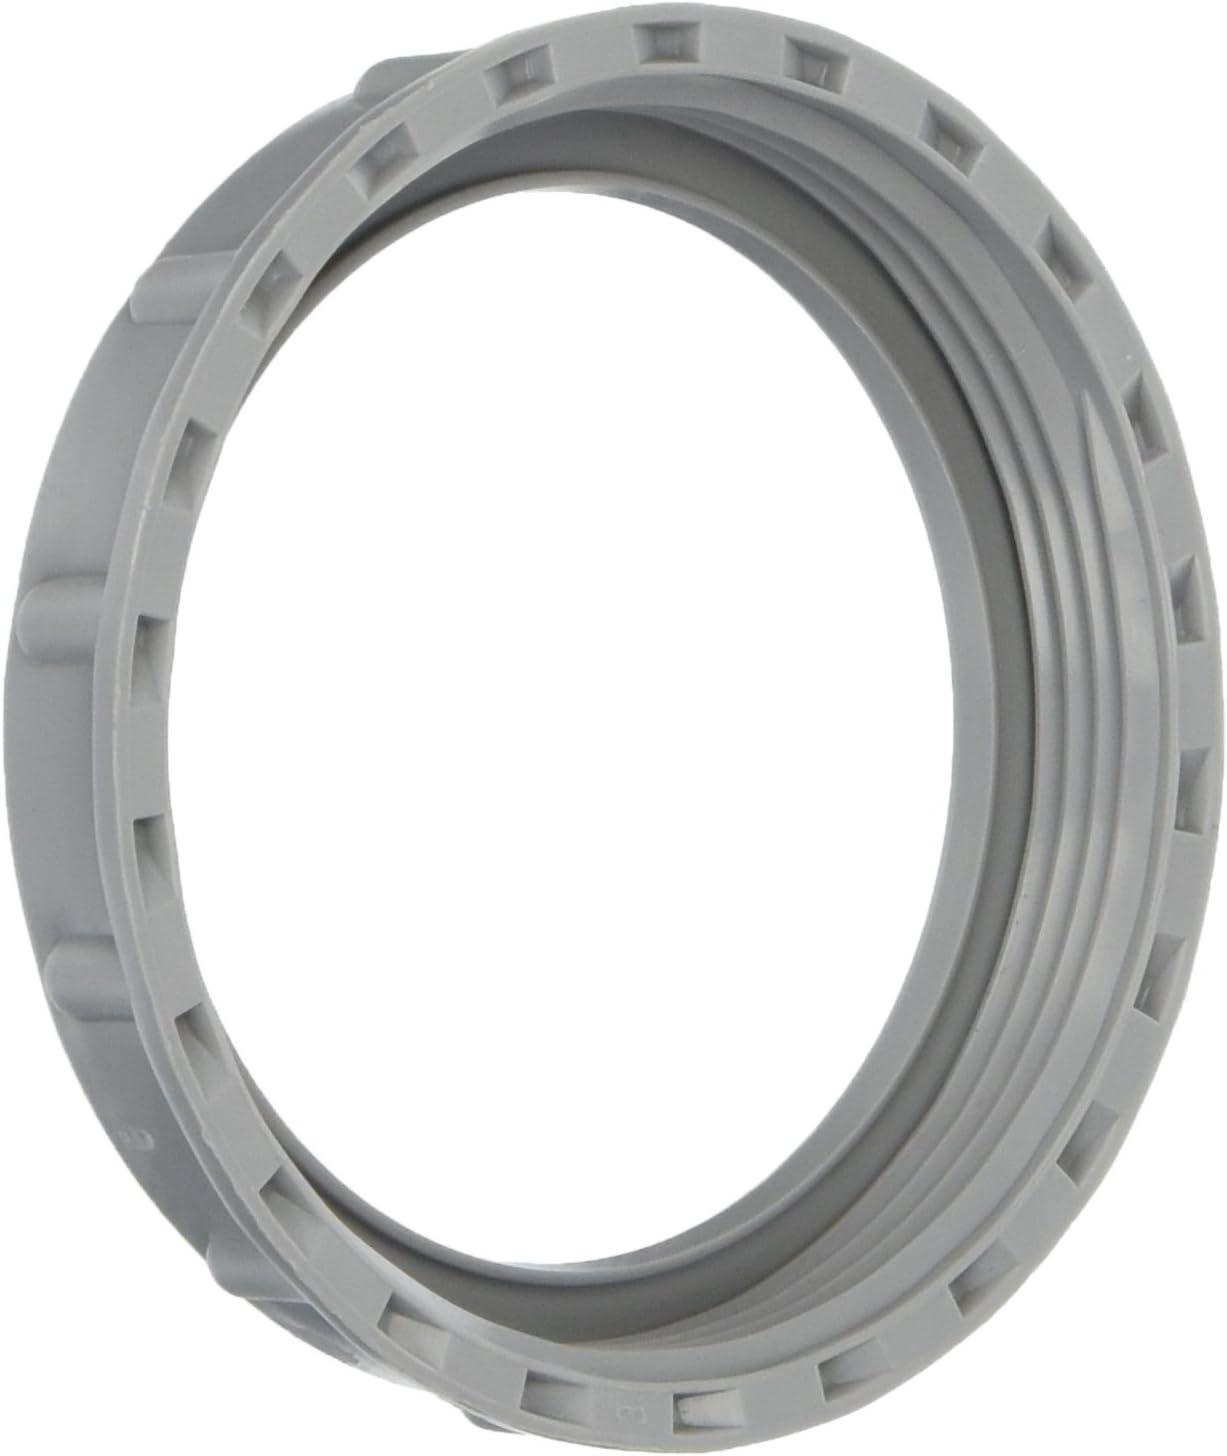 3 Halex 75230B Plastic Insulated Bushings for Rigid or Intermediate Metallic Conduit IMC 10 Piece Fittings Thermoplastic